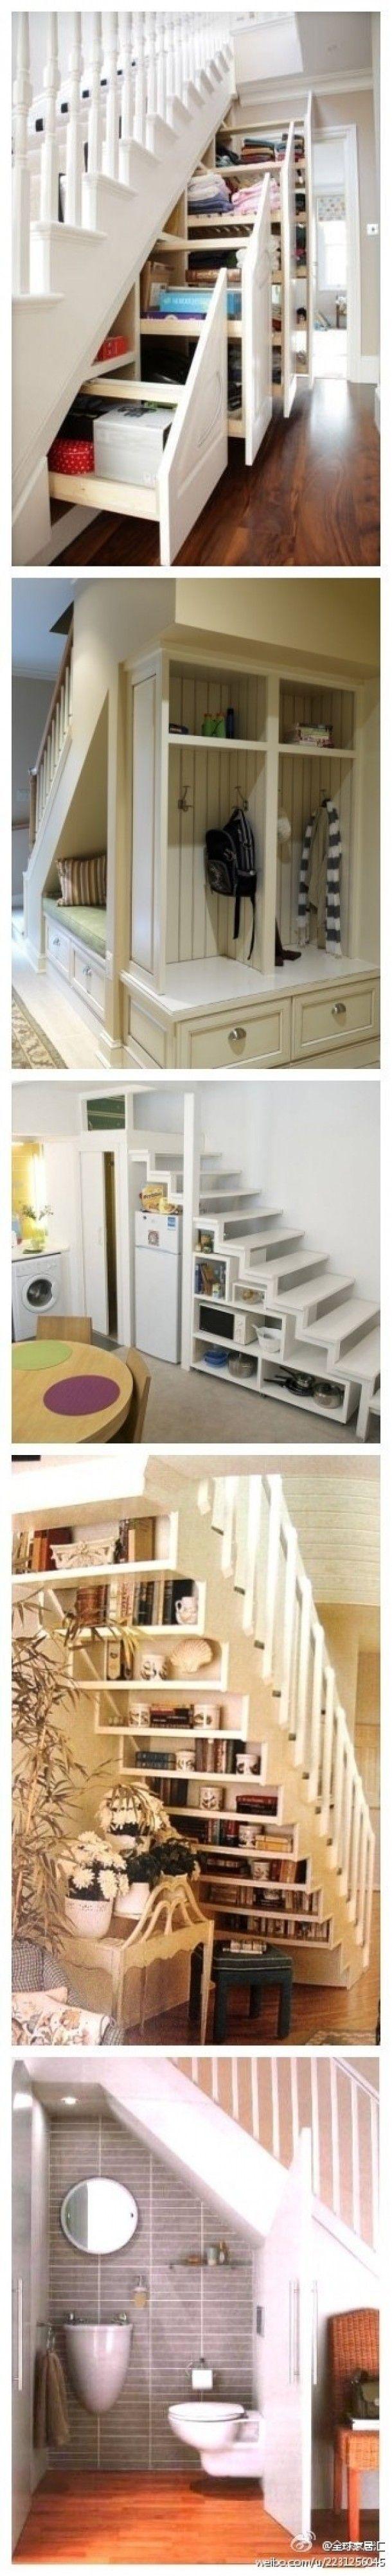 ruimte onder trap benutten